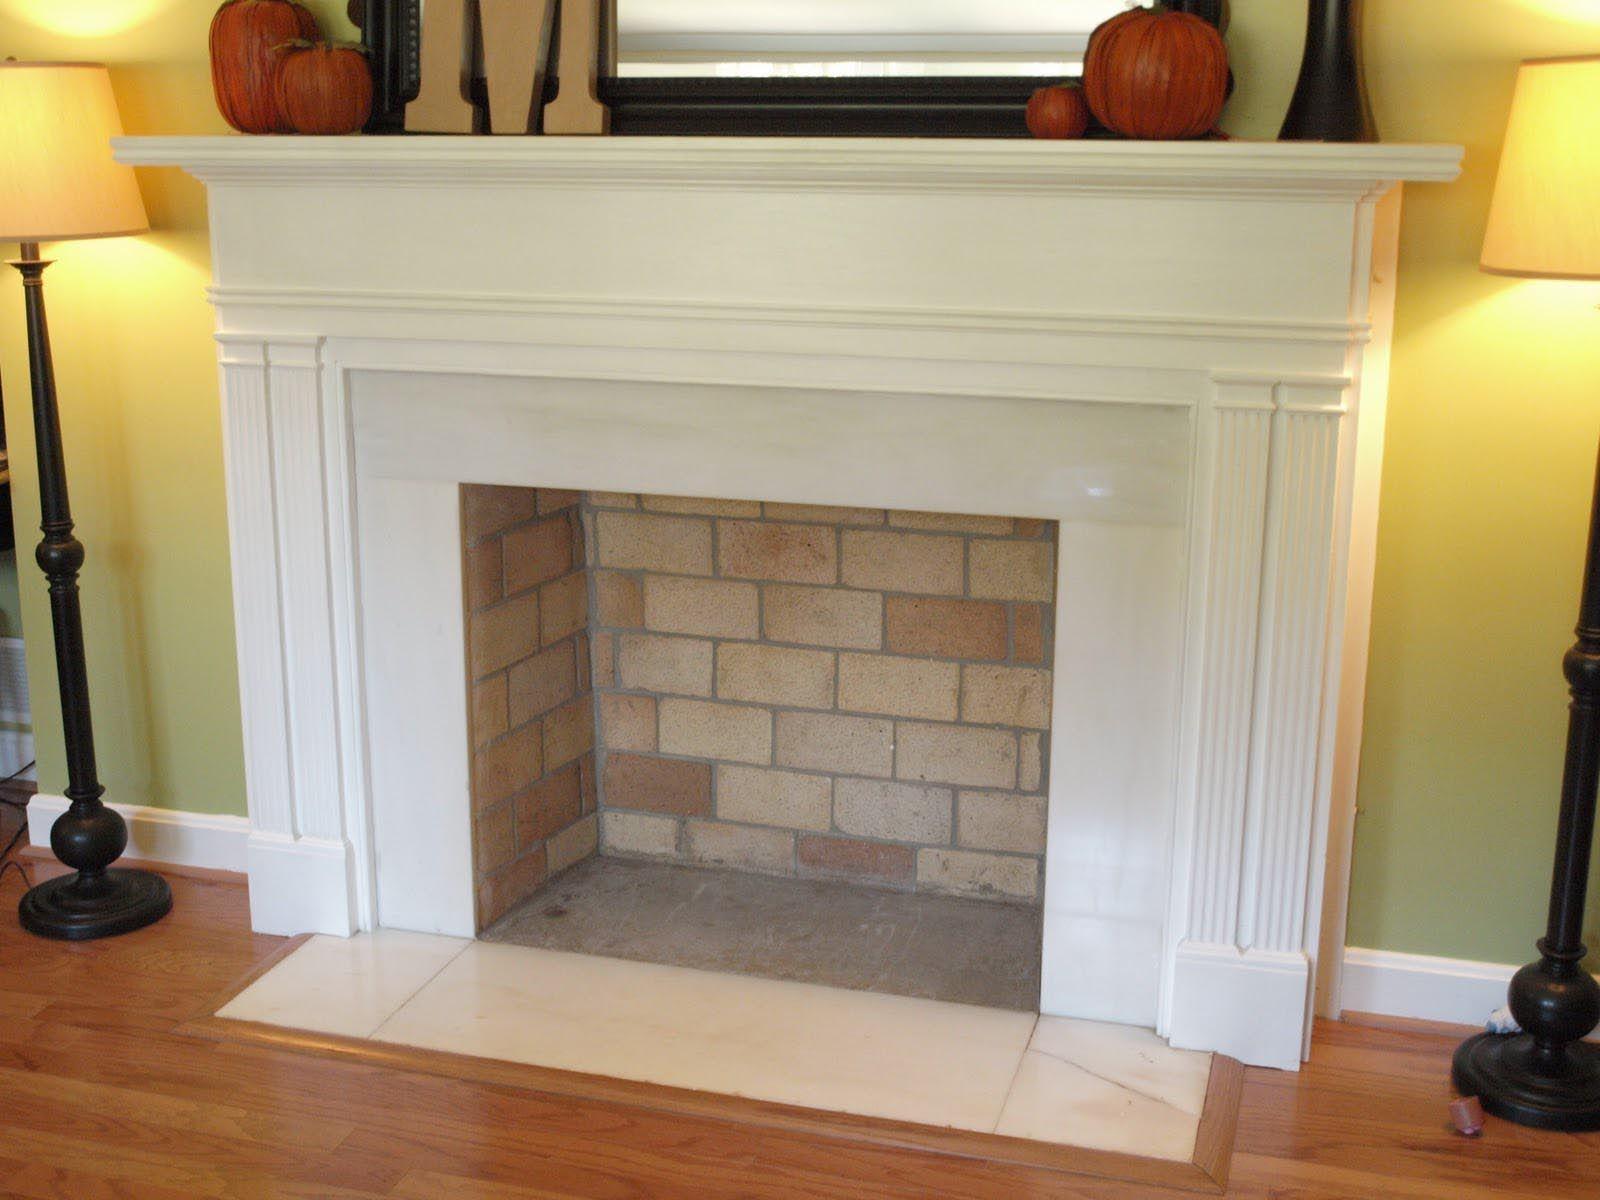 Faux Fireplace Mantel Diy Chimeneas Decorativas